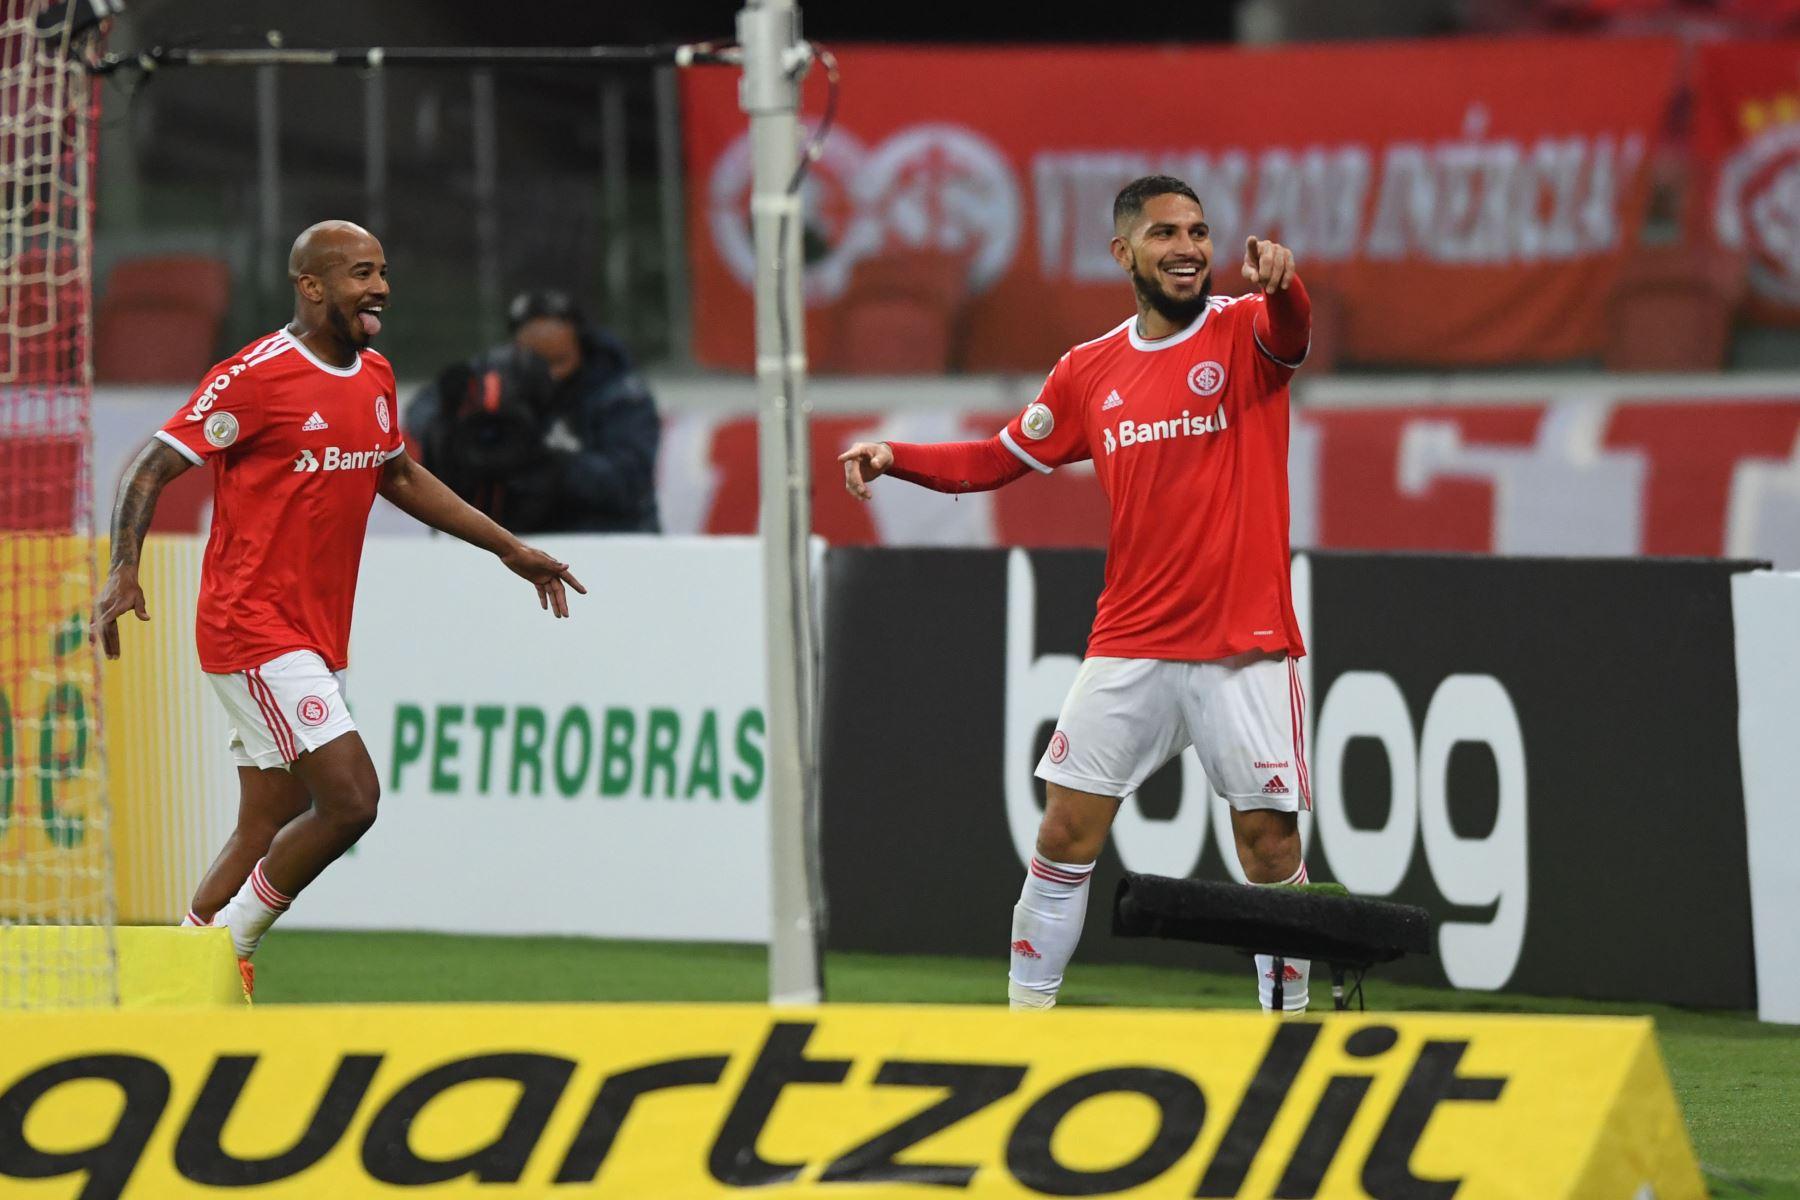 Con golazo de  Paolo Guerrero, Internacional vence 2-0 a Santos por el campeonato Brasileño. Foto: Ricardo Duarte/ @scinternacional